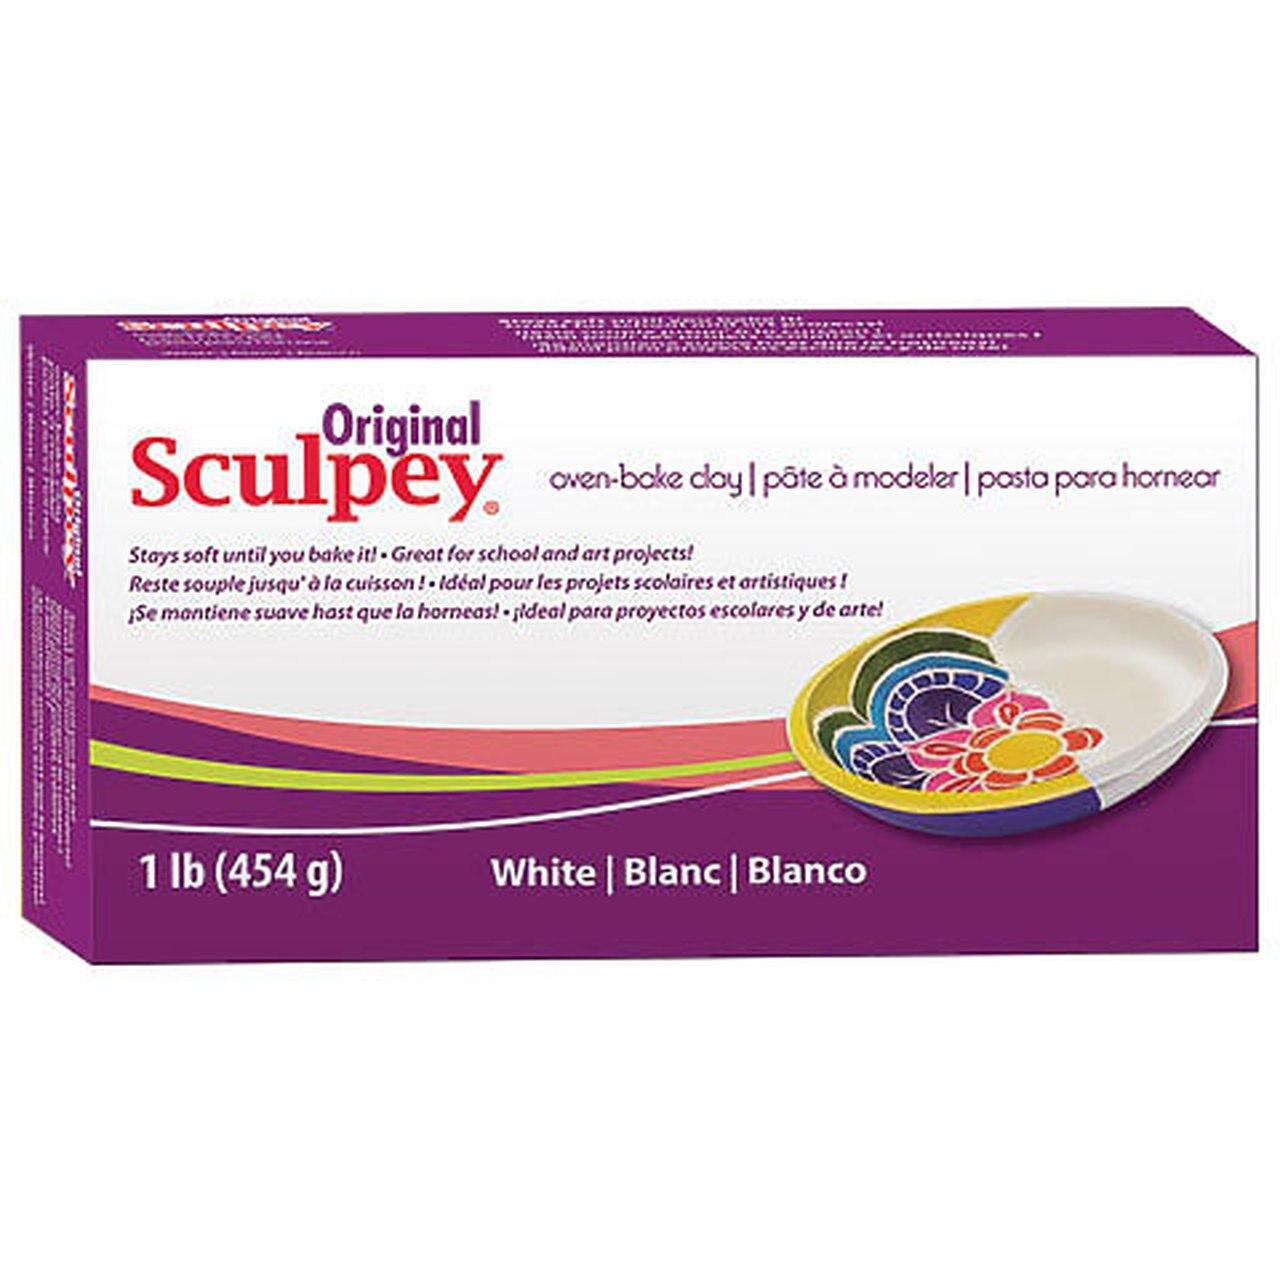 Sculpey Original